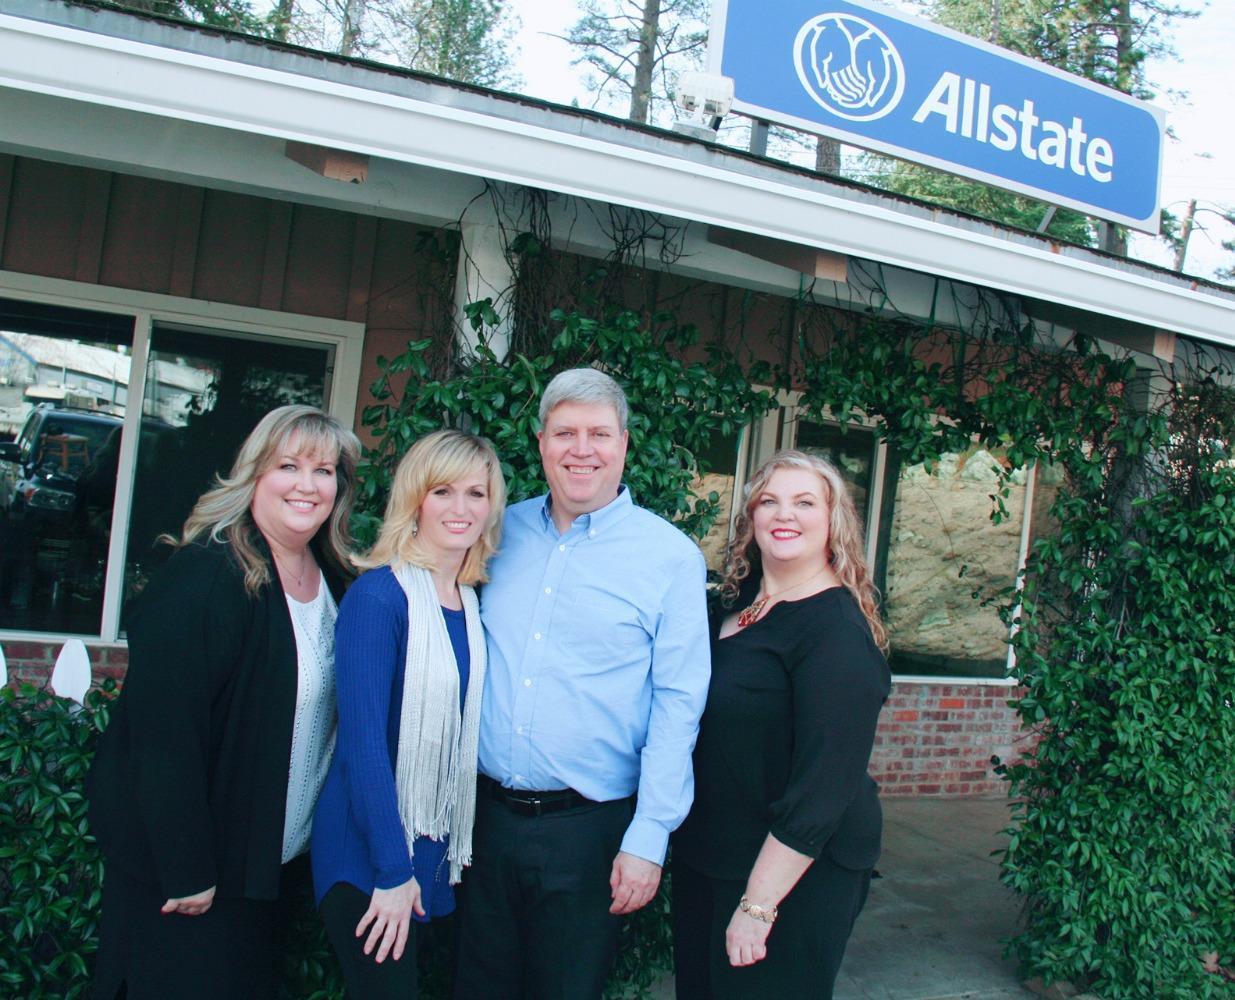 Bret Runolfson: Allstate Insurance image 1